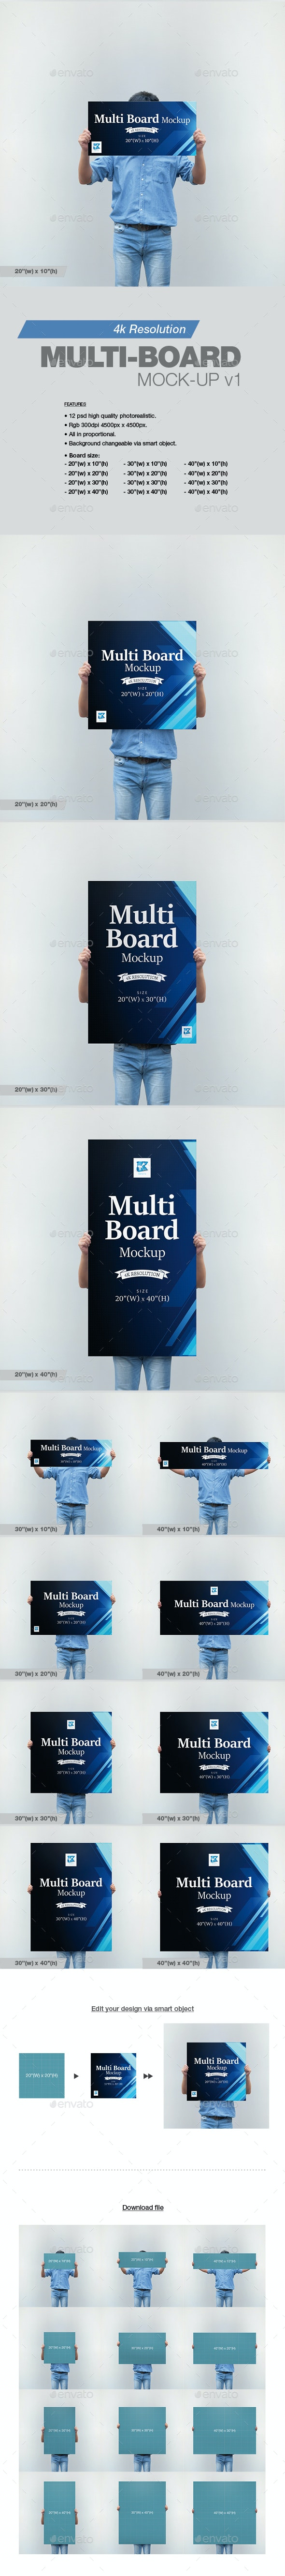 Multi-board Mock-up v1 - Print Product Mock-Ups